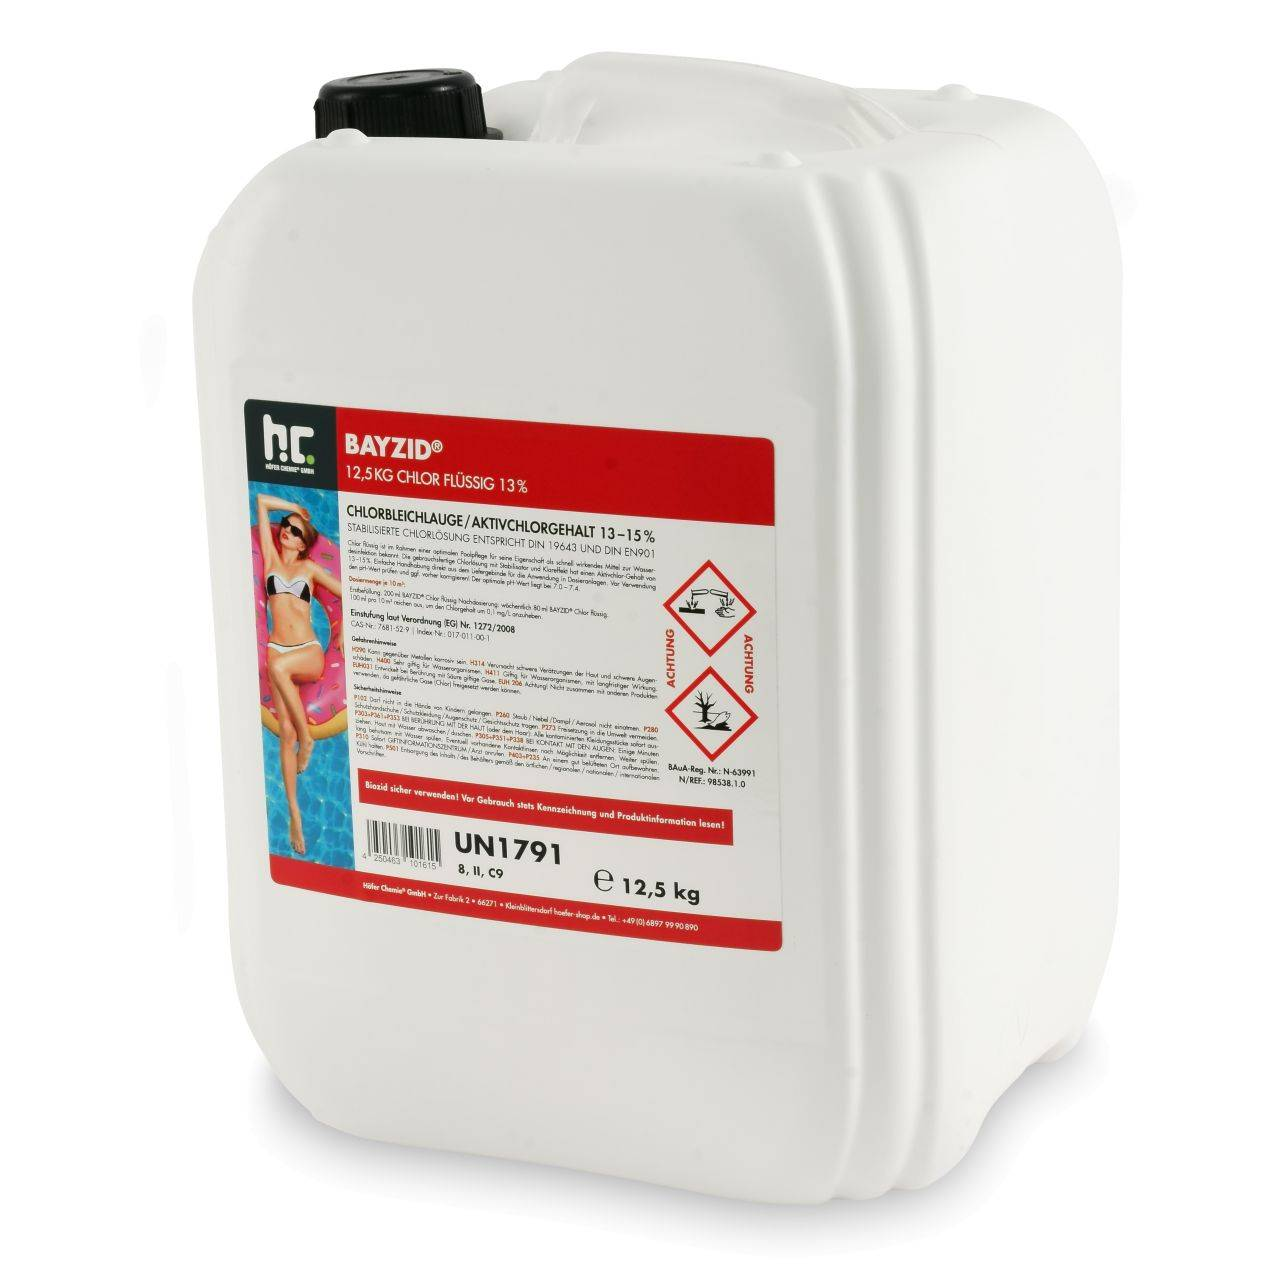 BAYZID 50 kg Bayzid® Chlore liquide 48° (4 x 12.5 kg)